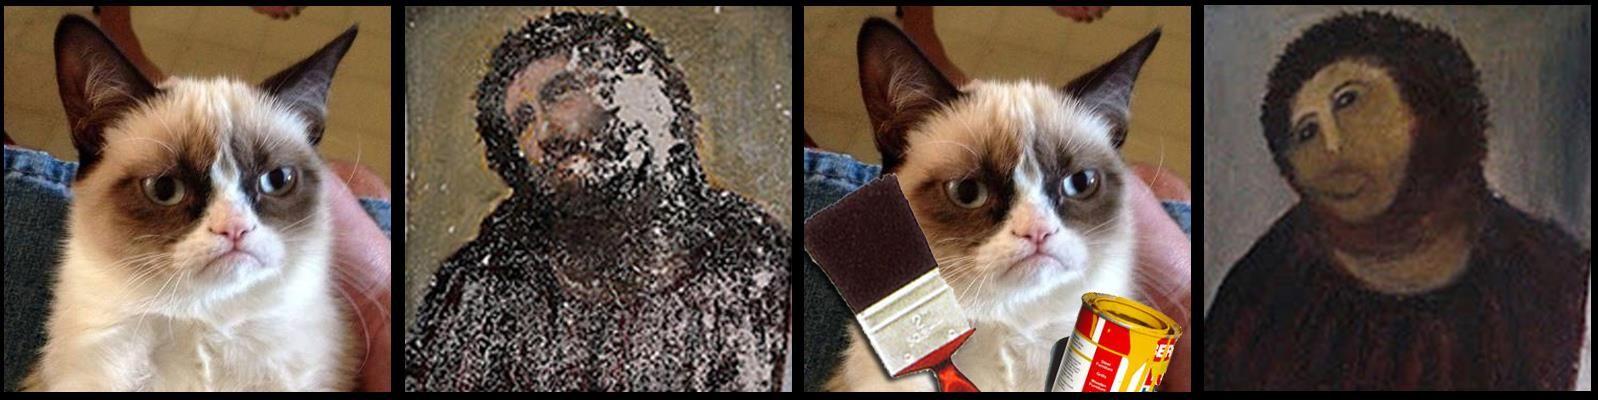 Grumpy Cat on art